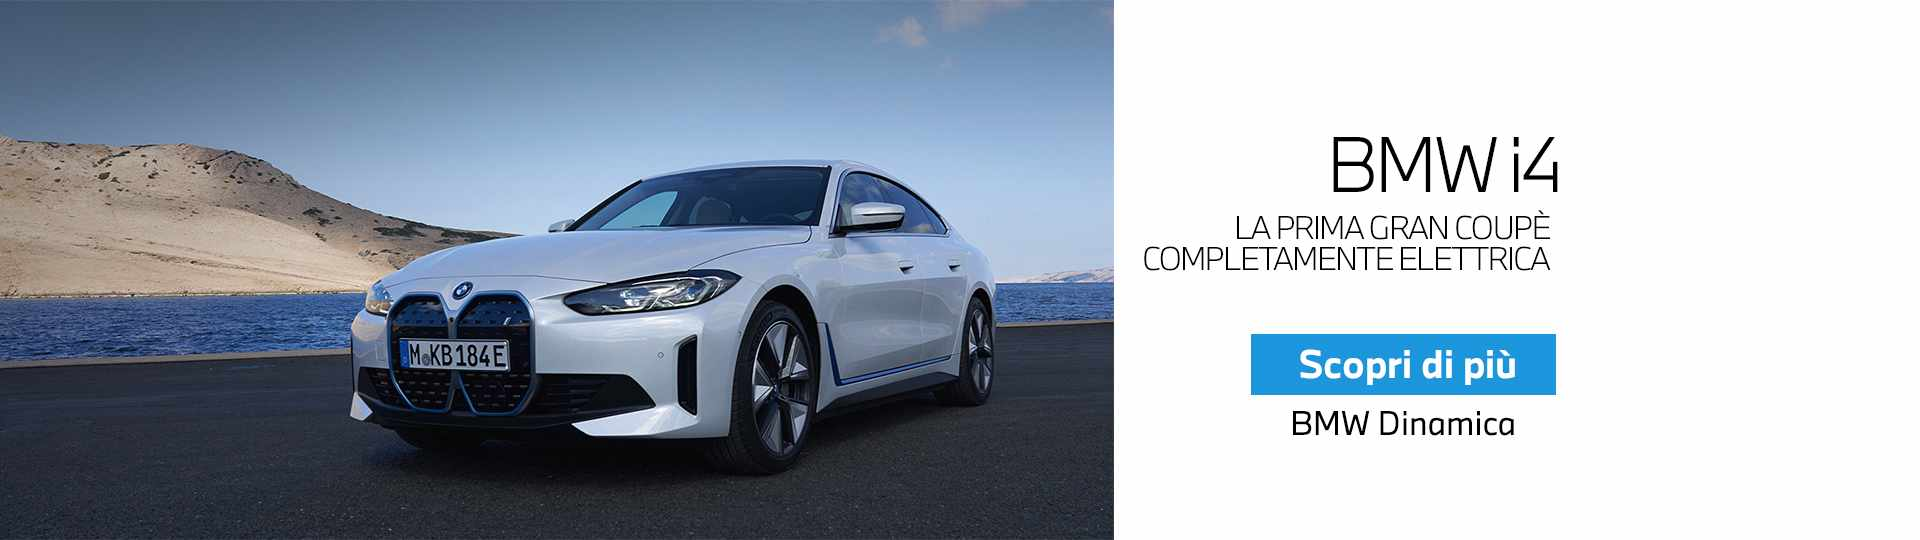 header_BMW I4_giugno 2021.jpg